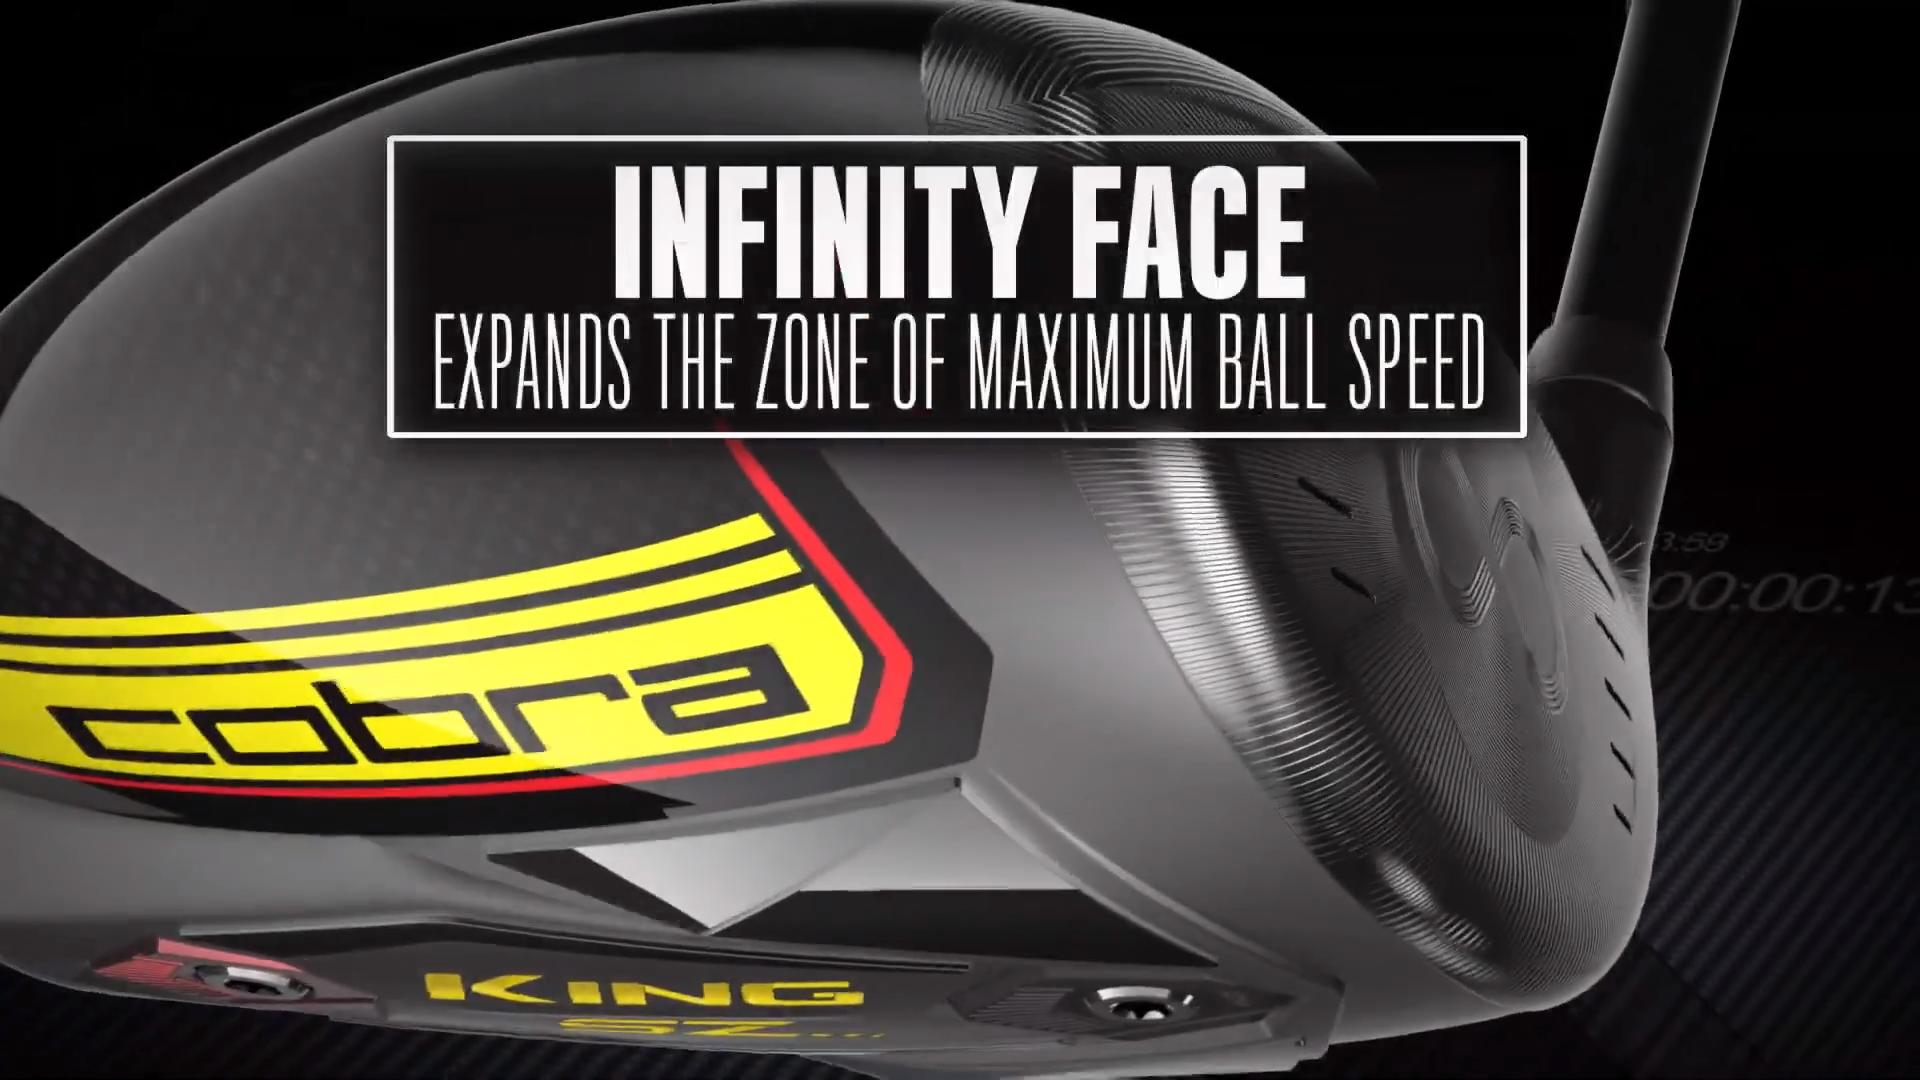 Cobra speedzone - Power zone - infinity face